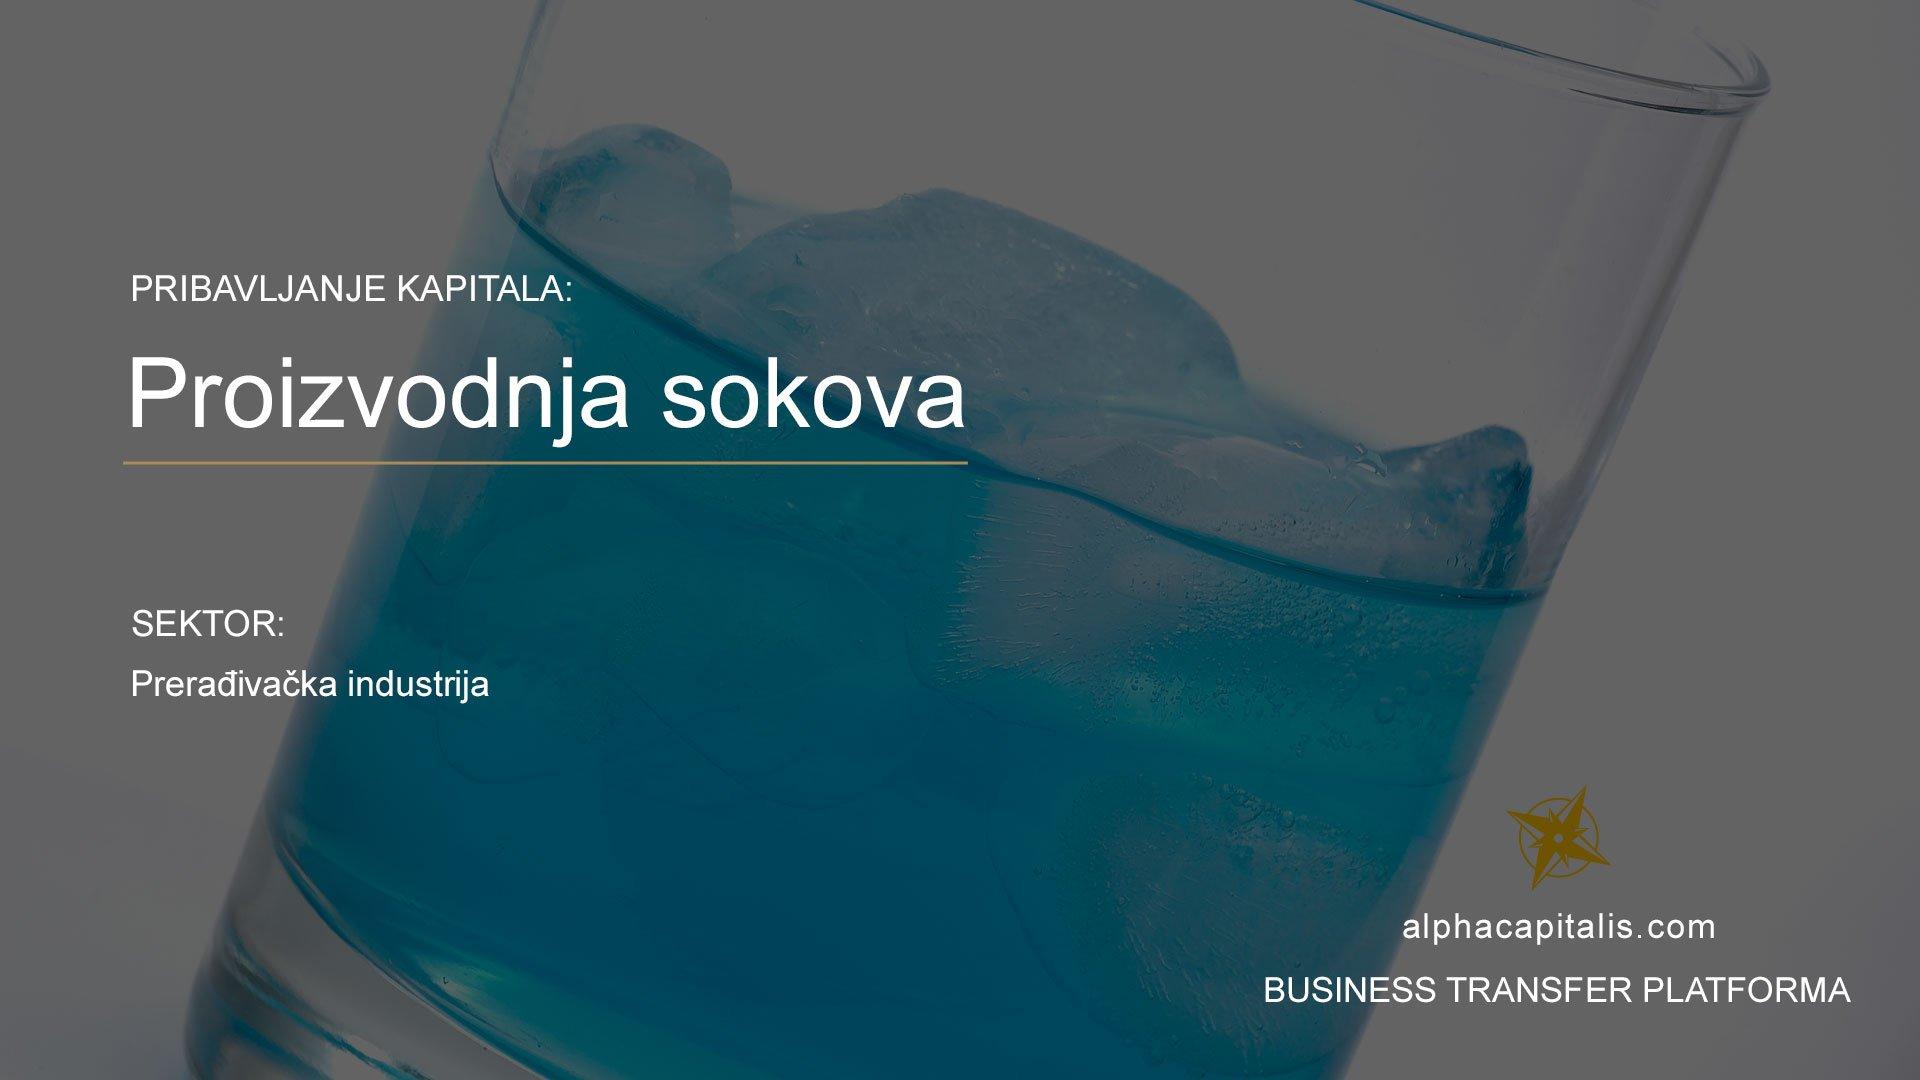 alpha-capitalis-business-transform-platforma-prodaja-biznisa